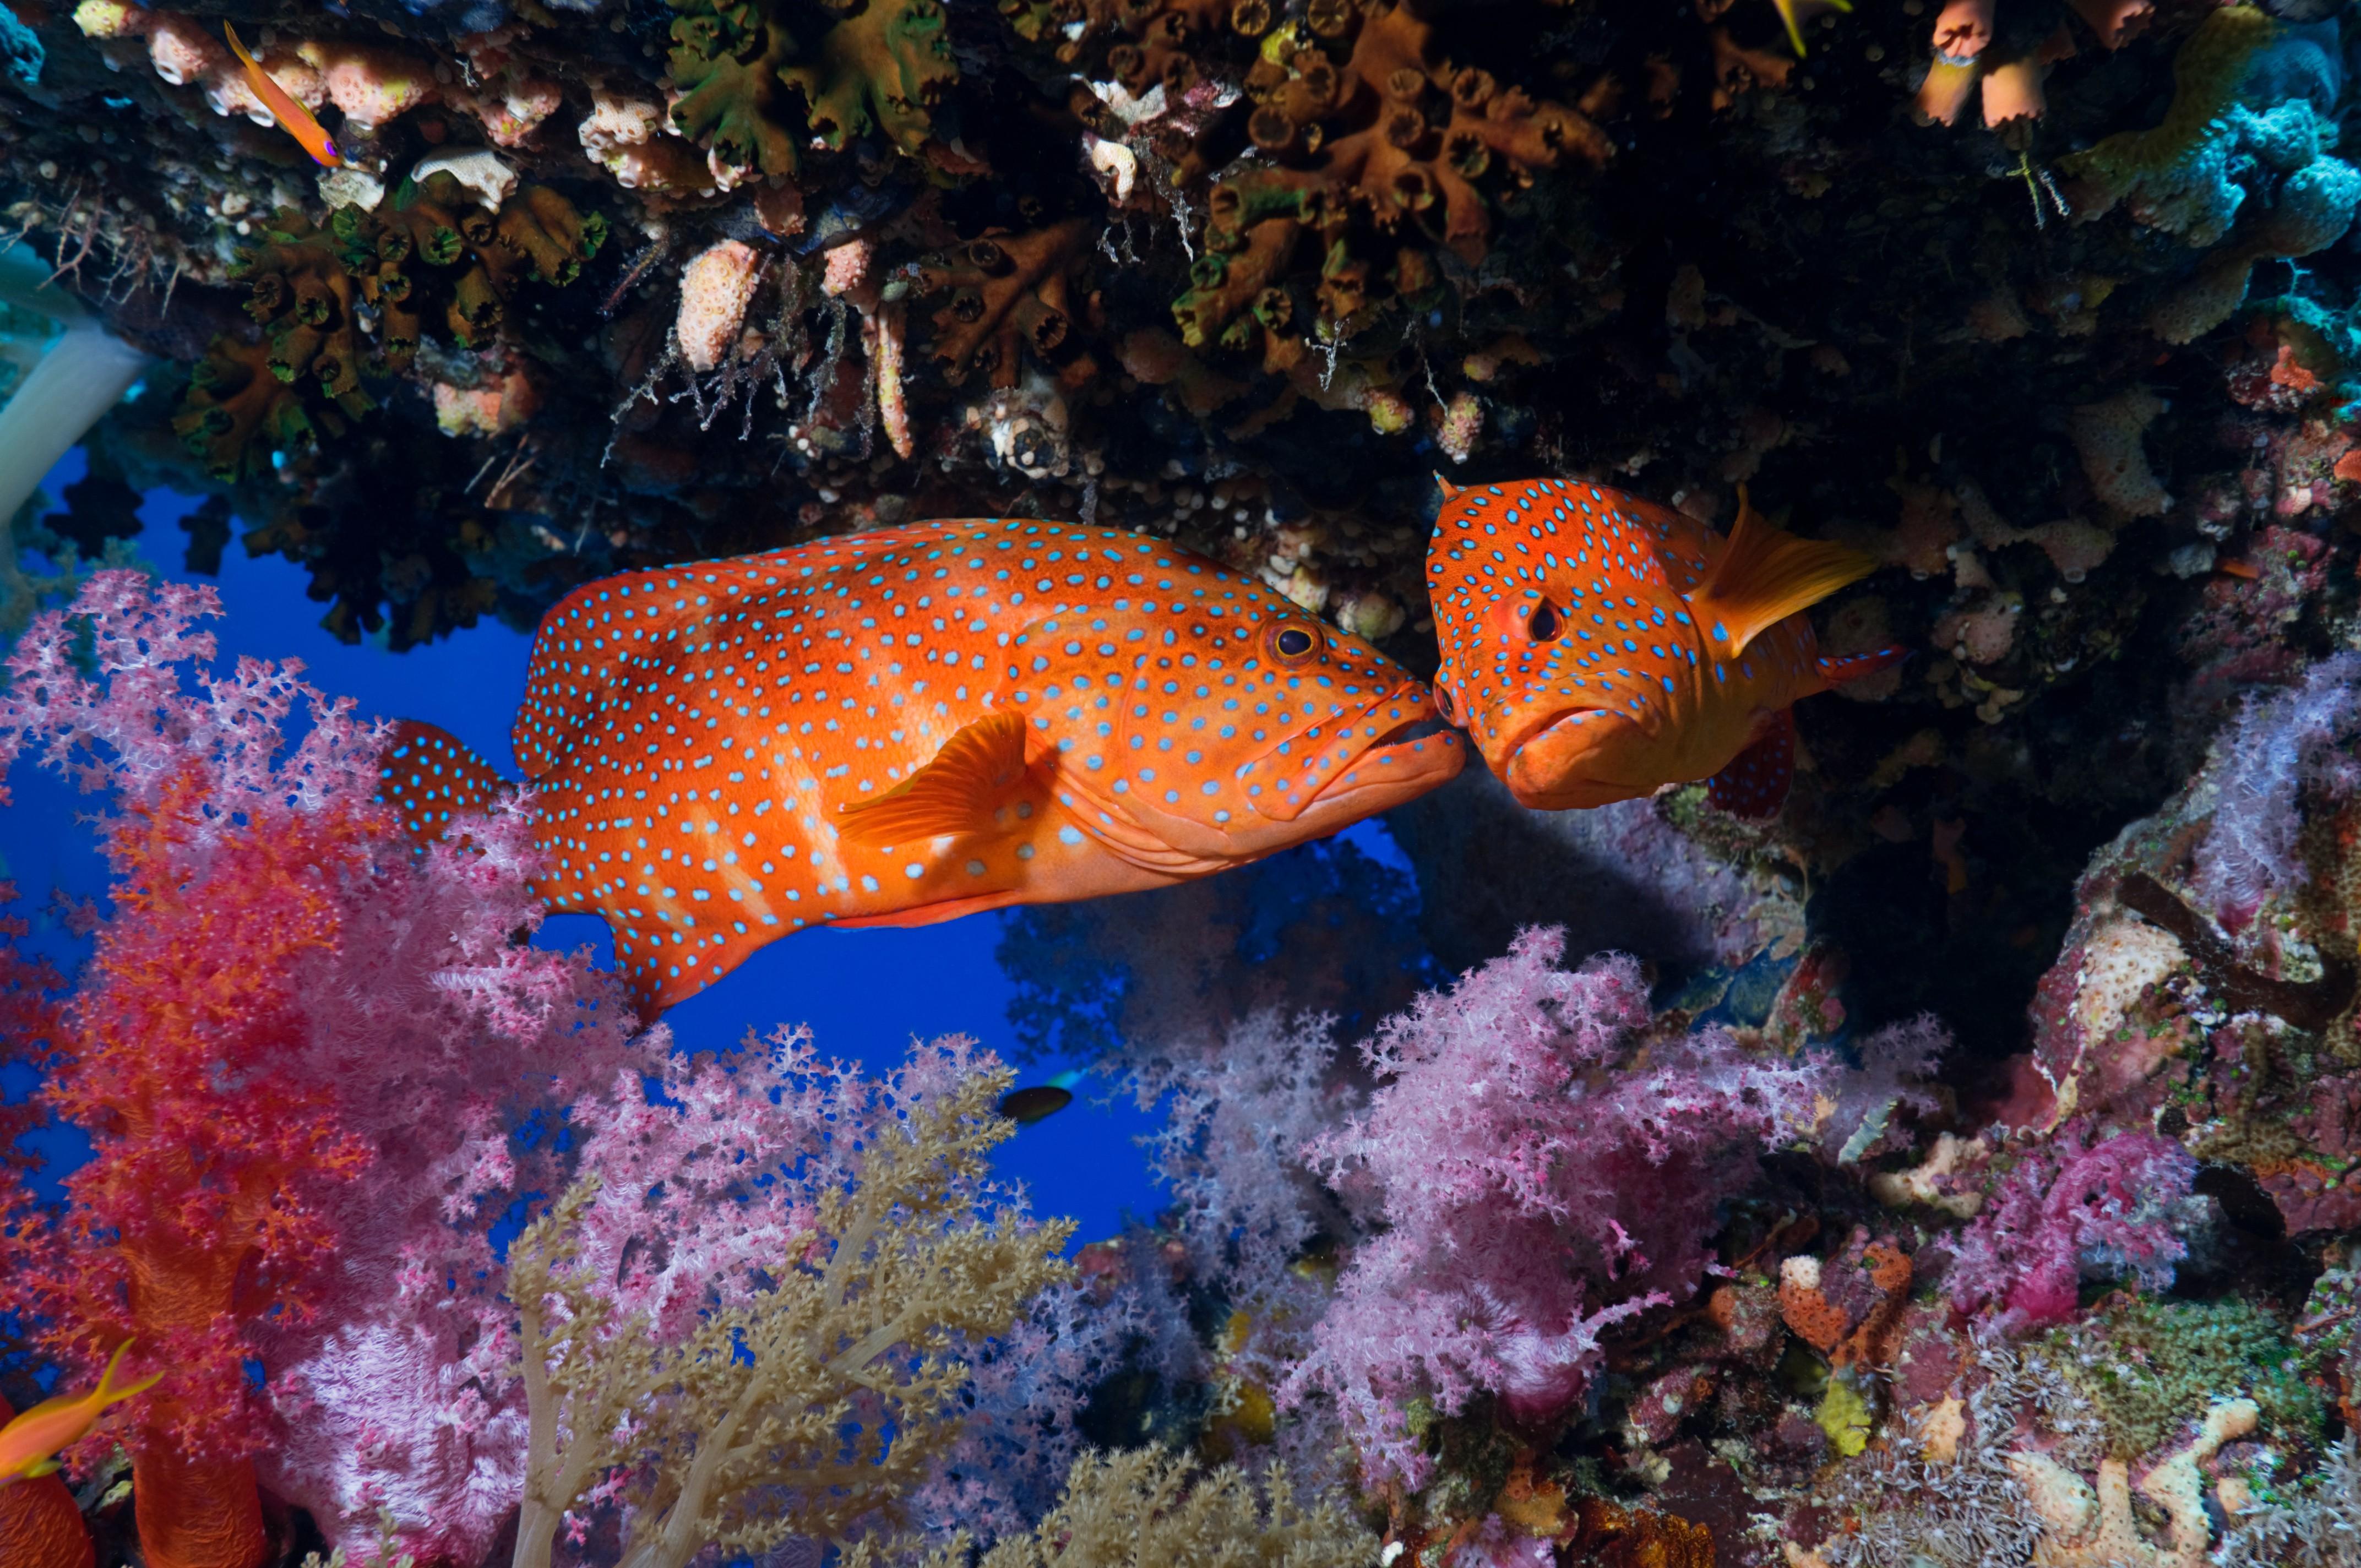 Wallpaper : animals, underwater, coral reef, National ... - photo#37